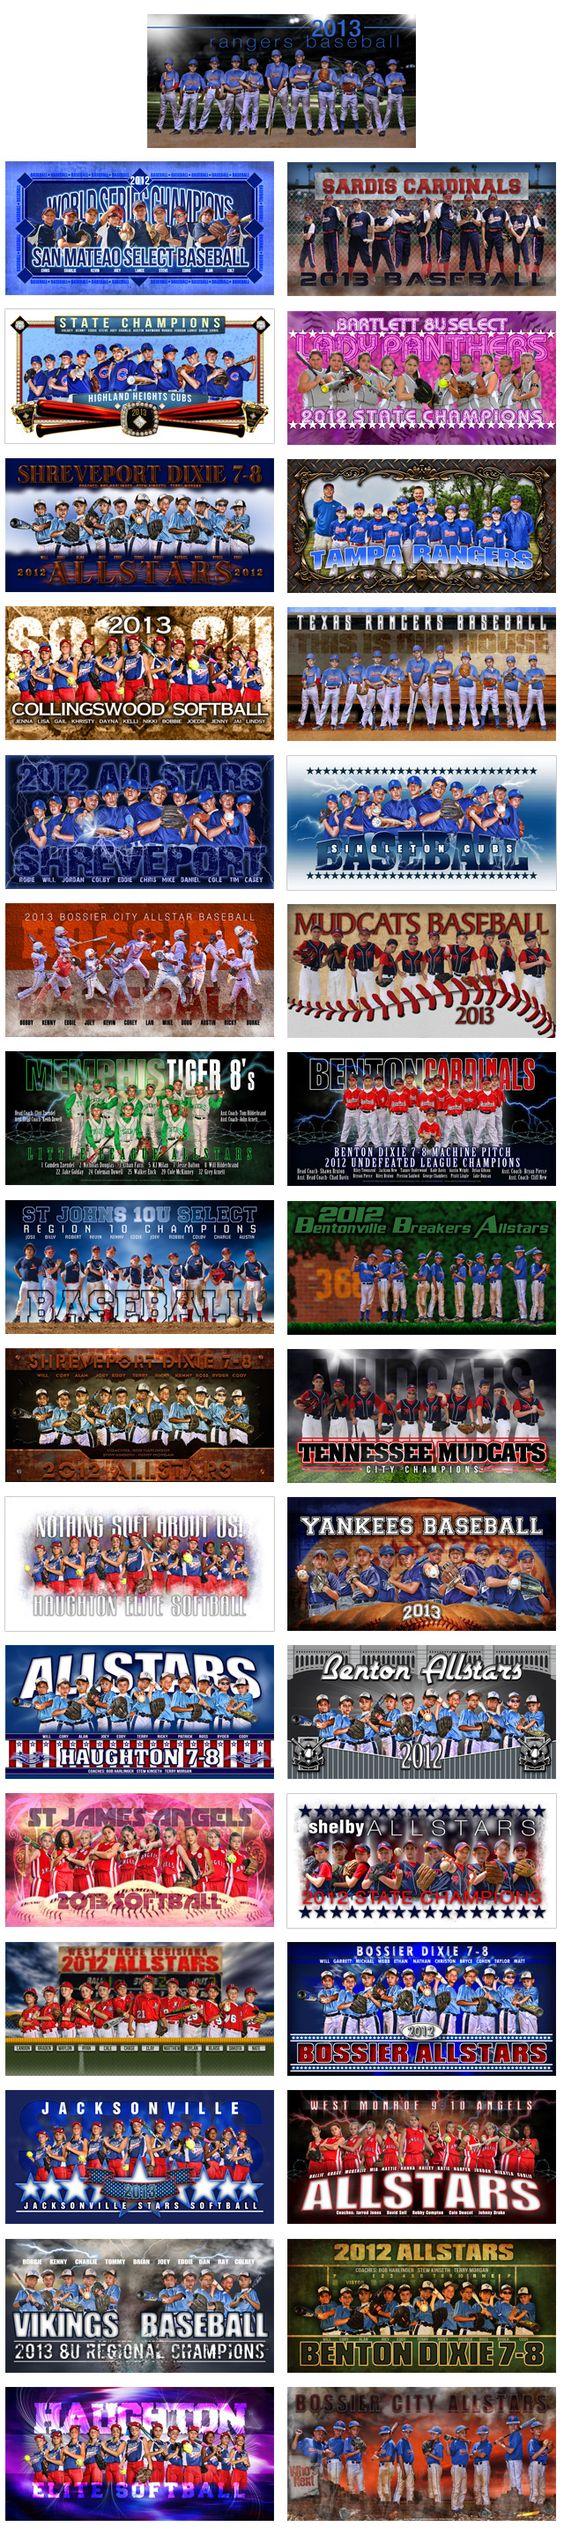 Team Banner Special - SportsZoneTemplates.com